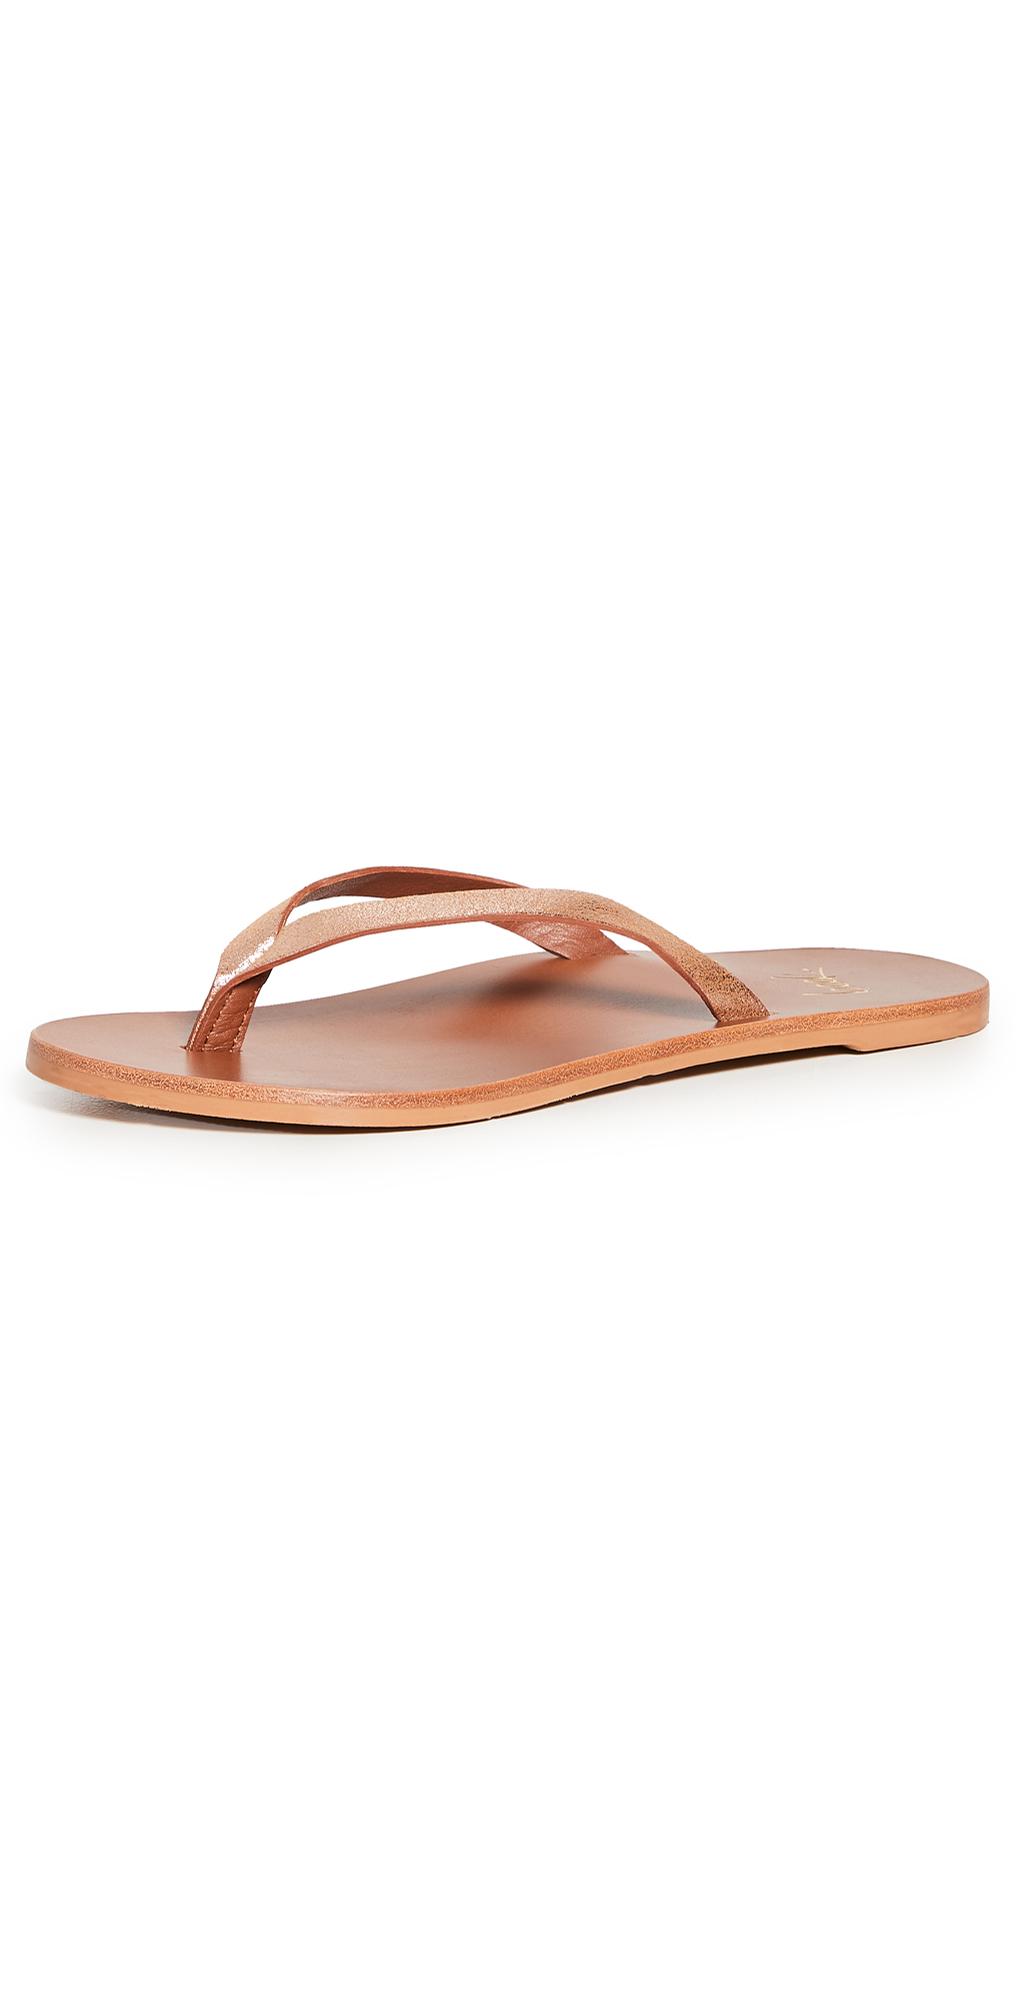 Seabird Sandals